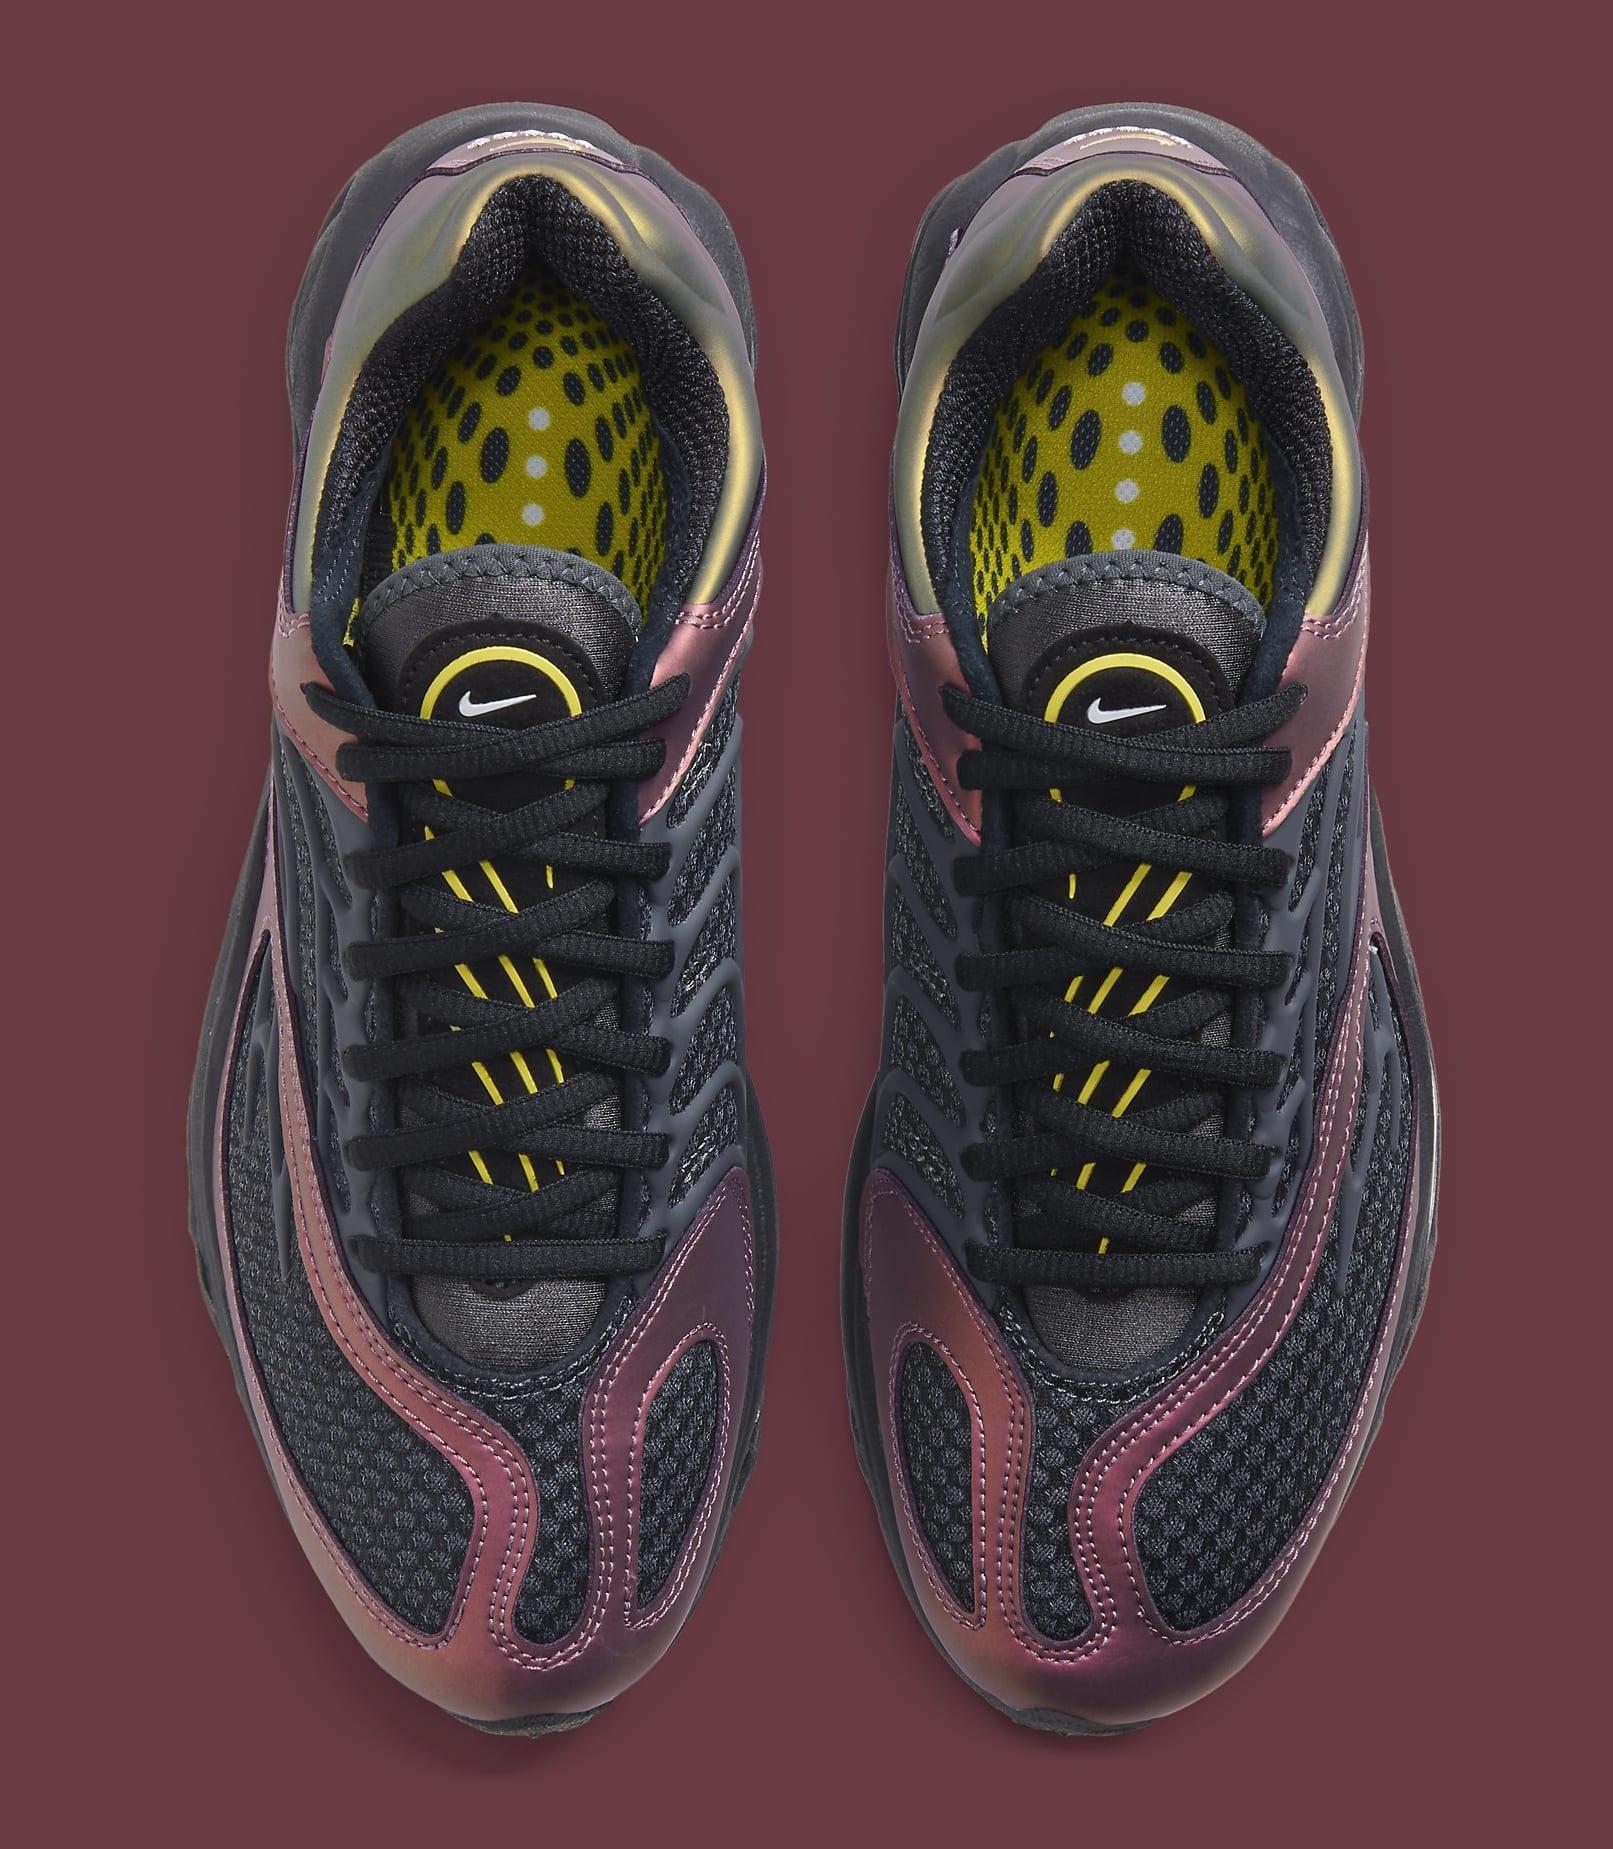 Nike Air Tuned Max Black/Celery/Dark Charcoal CV6984-001 Top